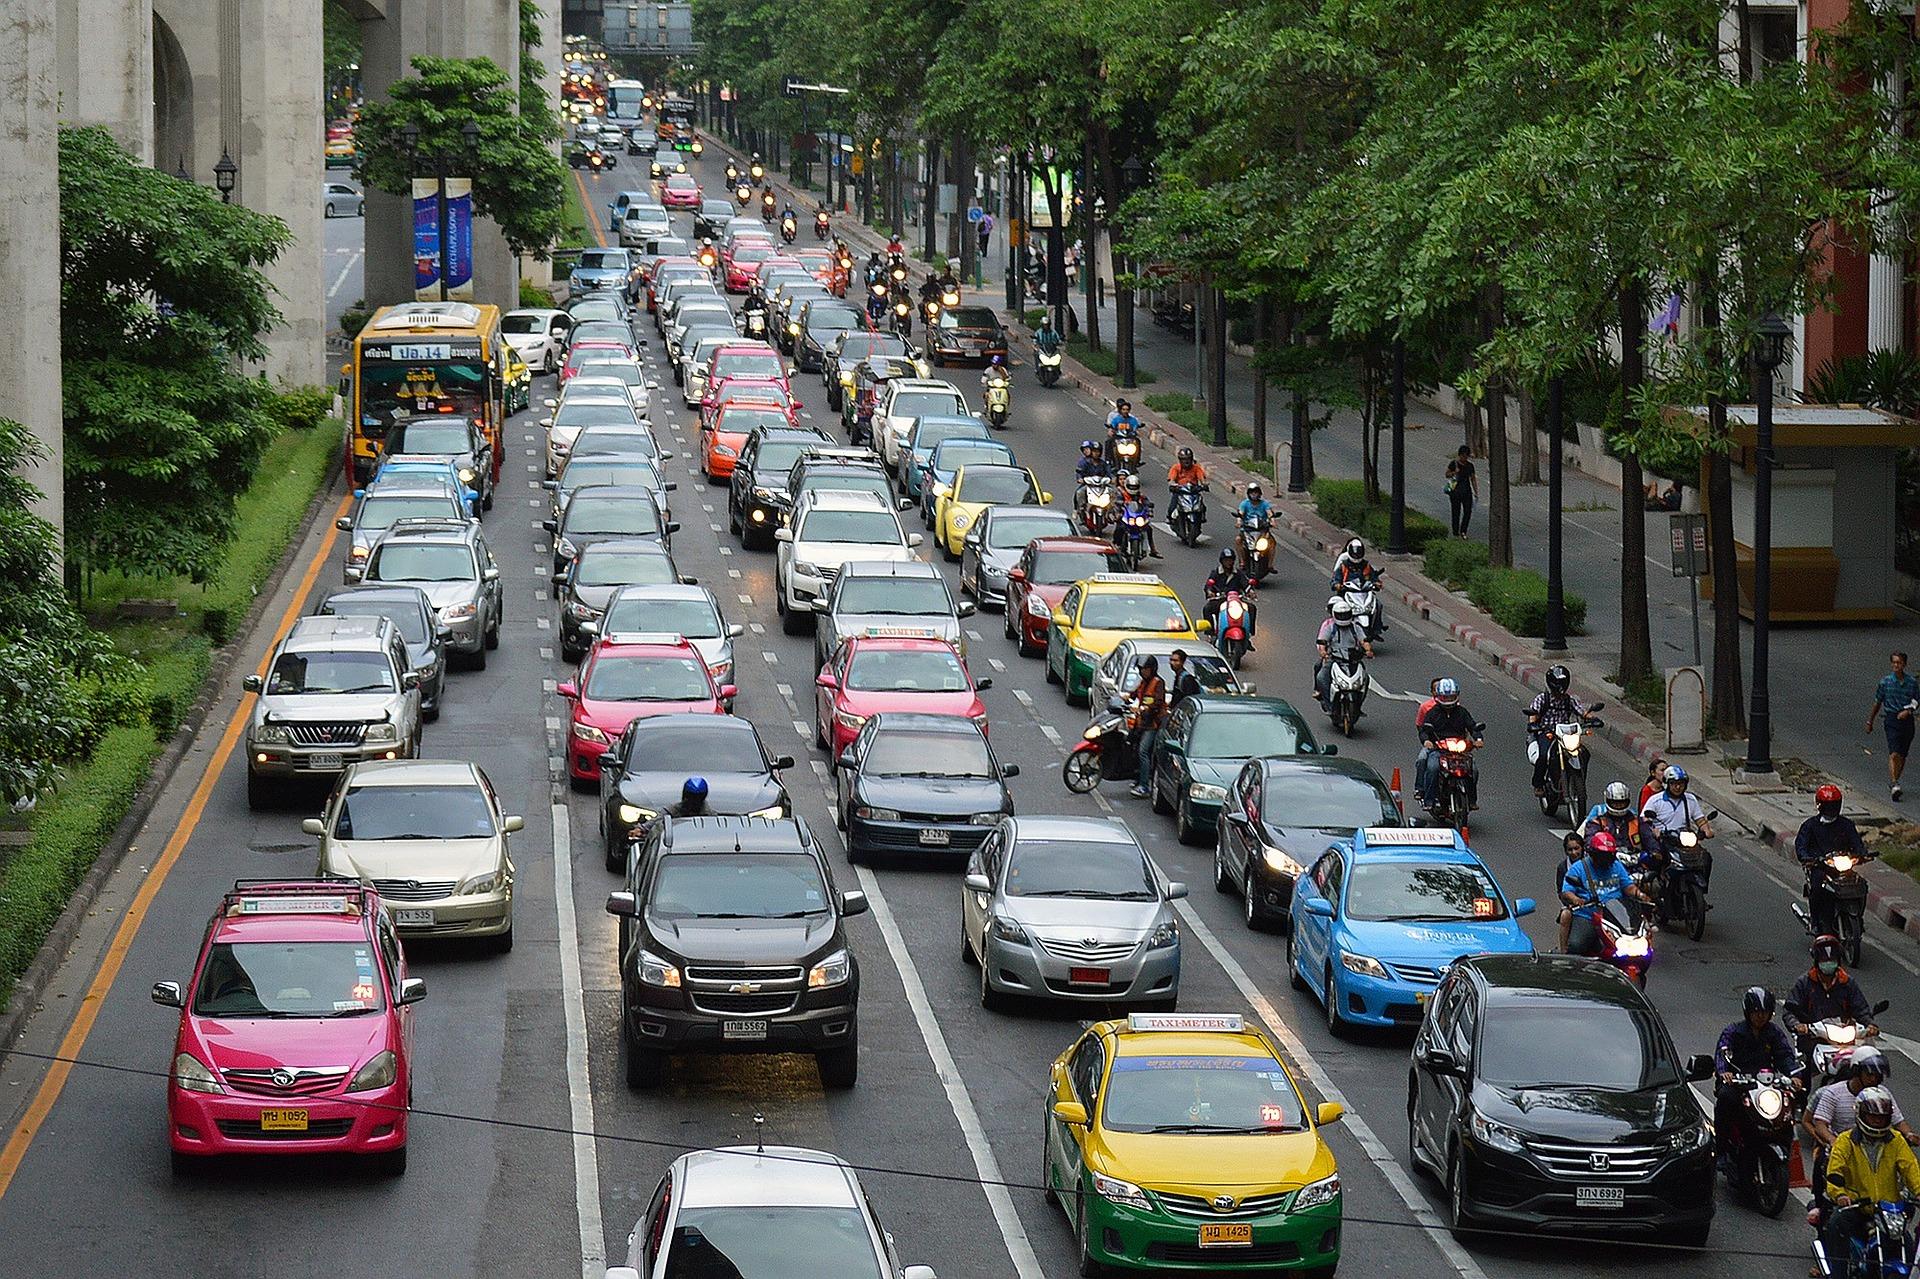 traffic-843309_1920.jpg